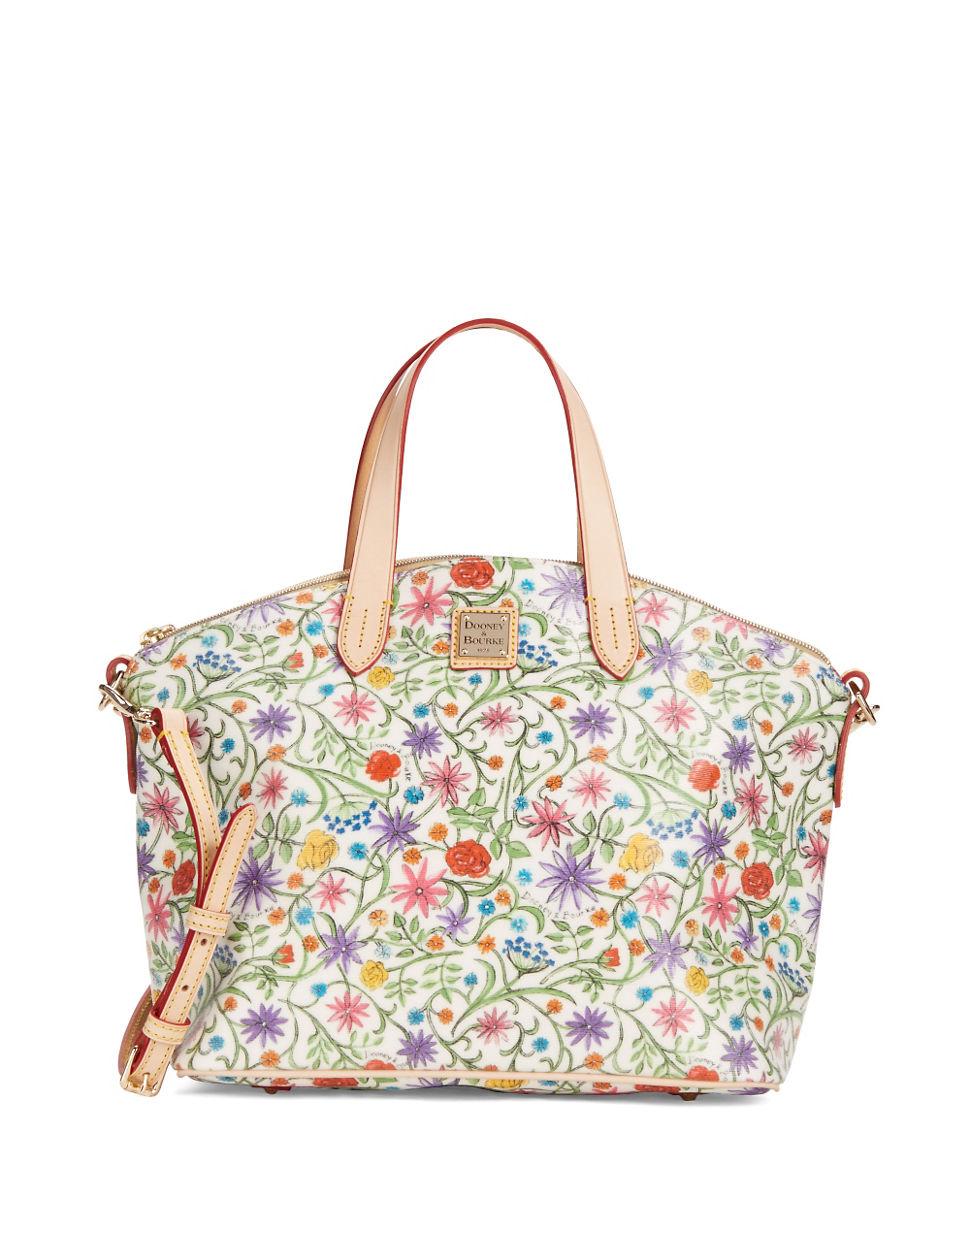 Dooney U0026 Bourke Eva Floral Satchel Bag In White | Lyst